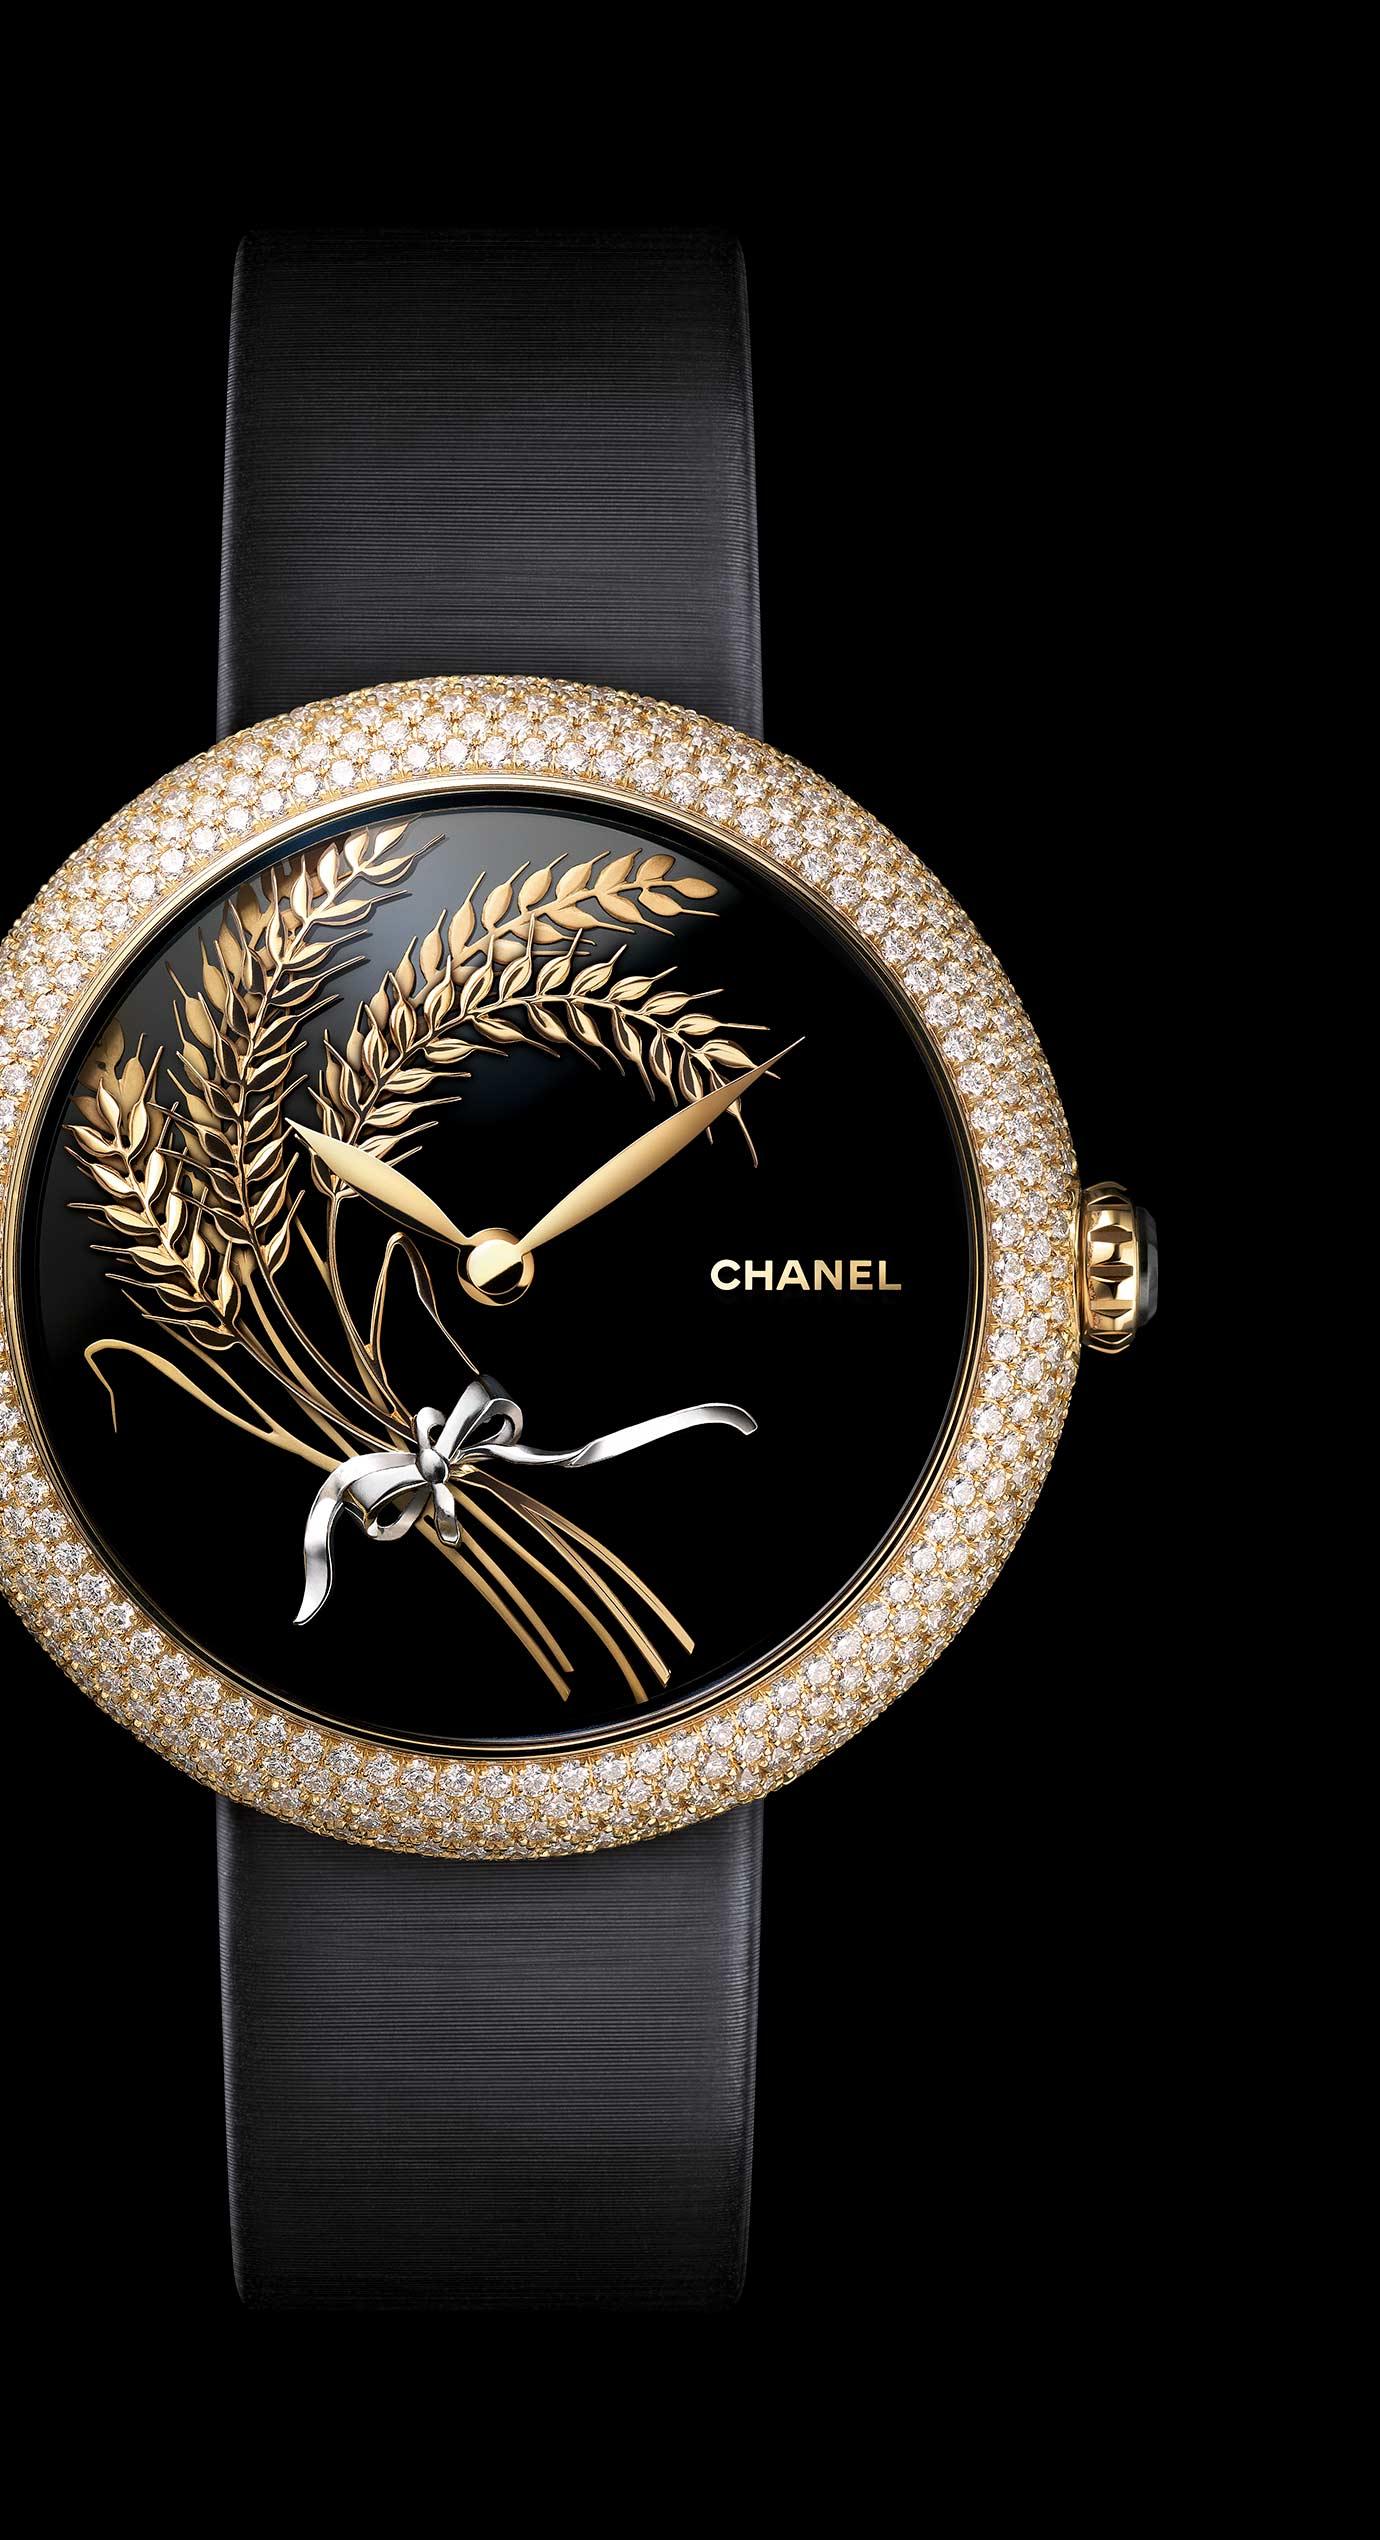 Reloj Mademoiselle Privé Joaillerie Les Blés de CHANEL - Ónice y oro esculpido - Vista ampliada